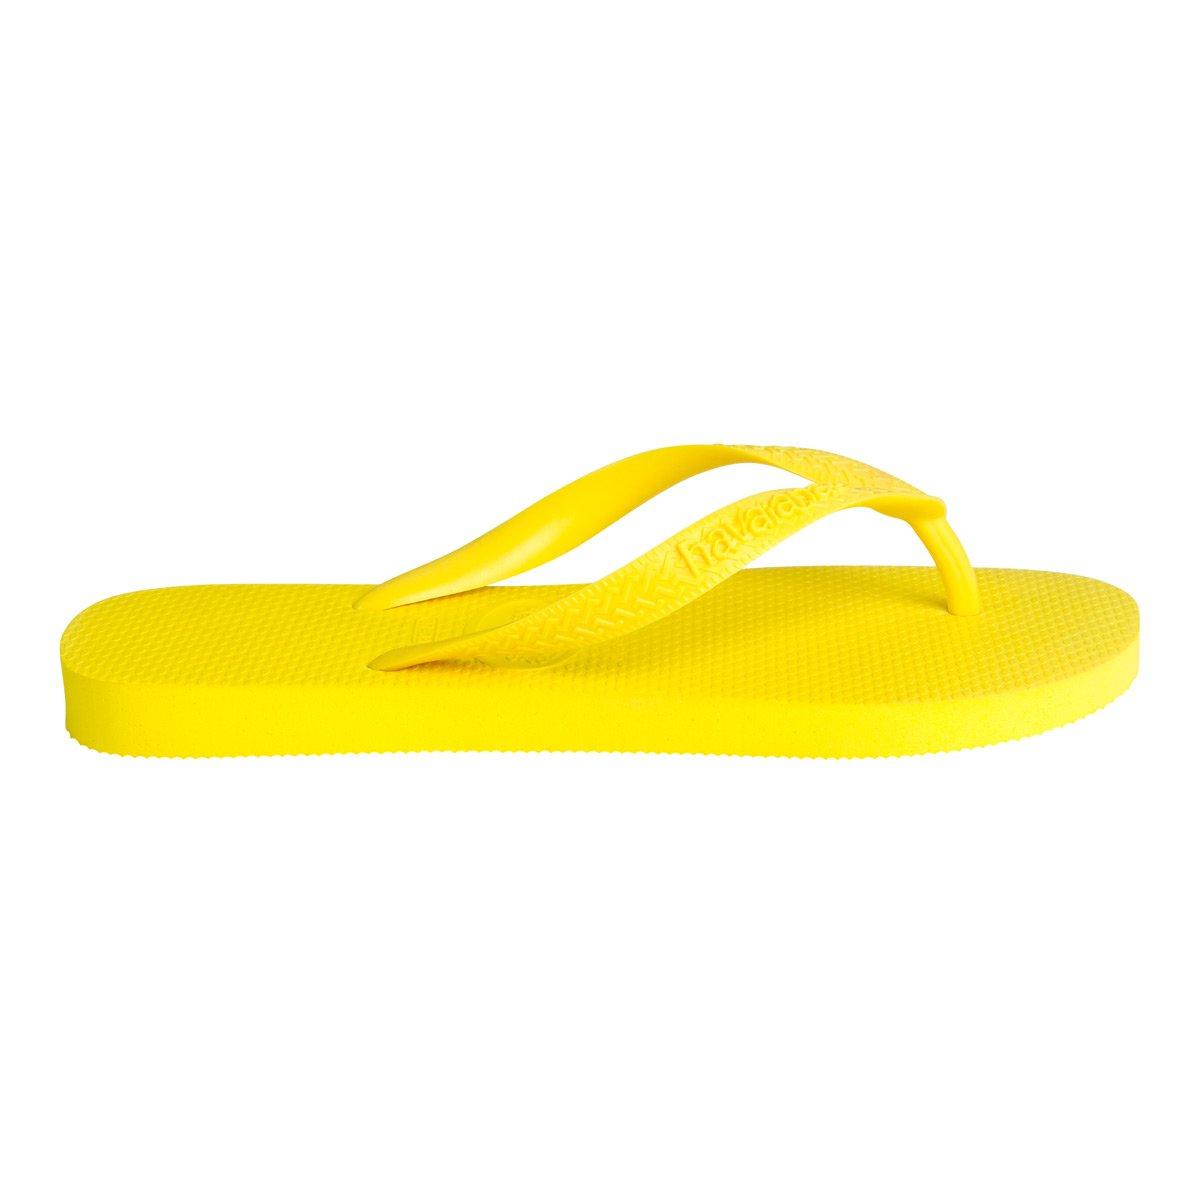 Havaianas Top Amarelo Havaianas Top Amarelo 7qY4f4